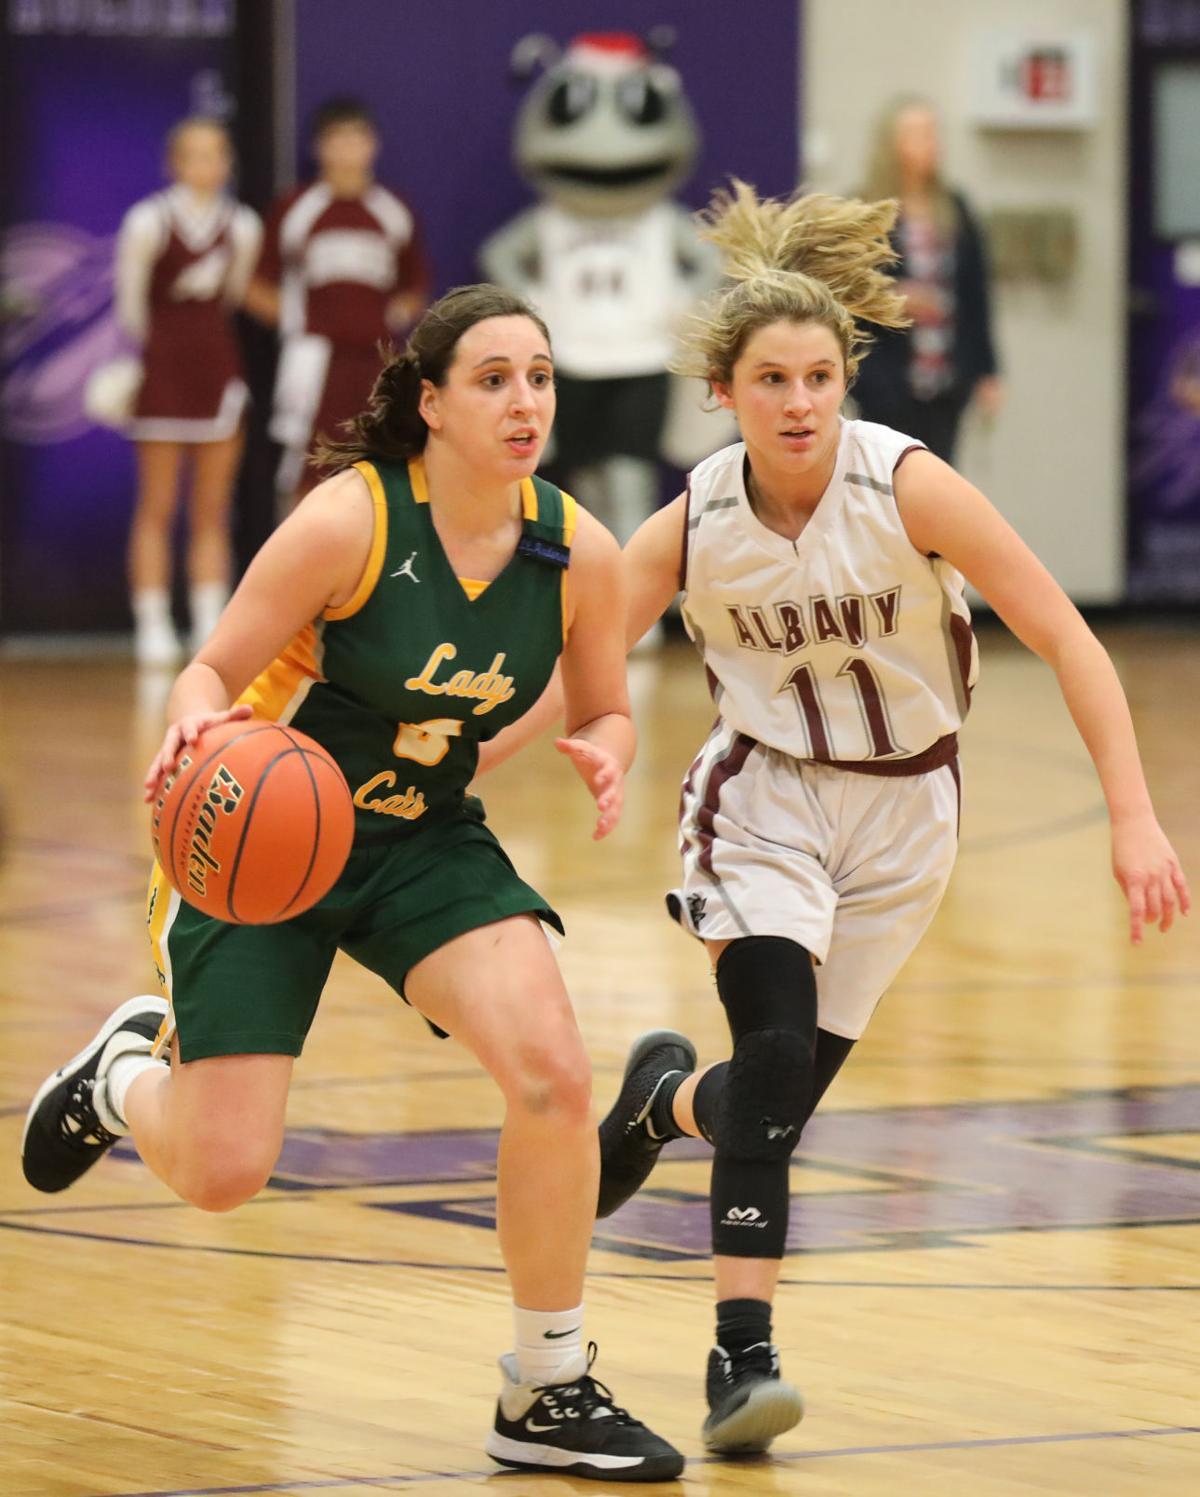 Walker vs. Albany girls basketball - Delaney Anderson, Haley Meyers